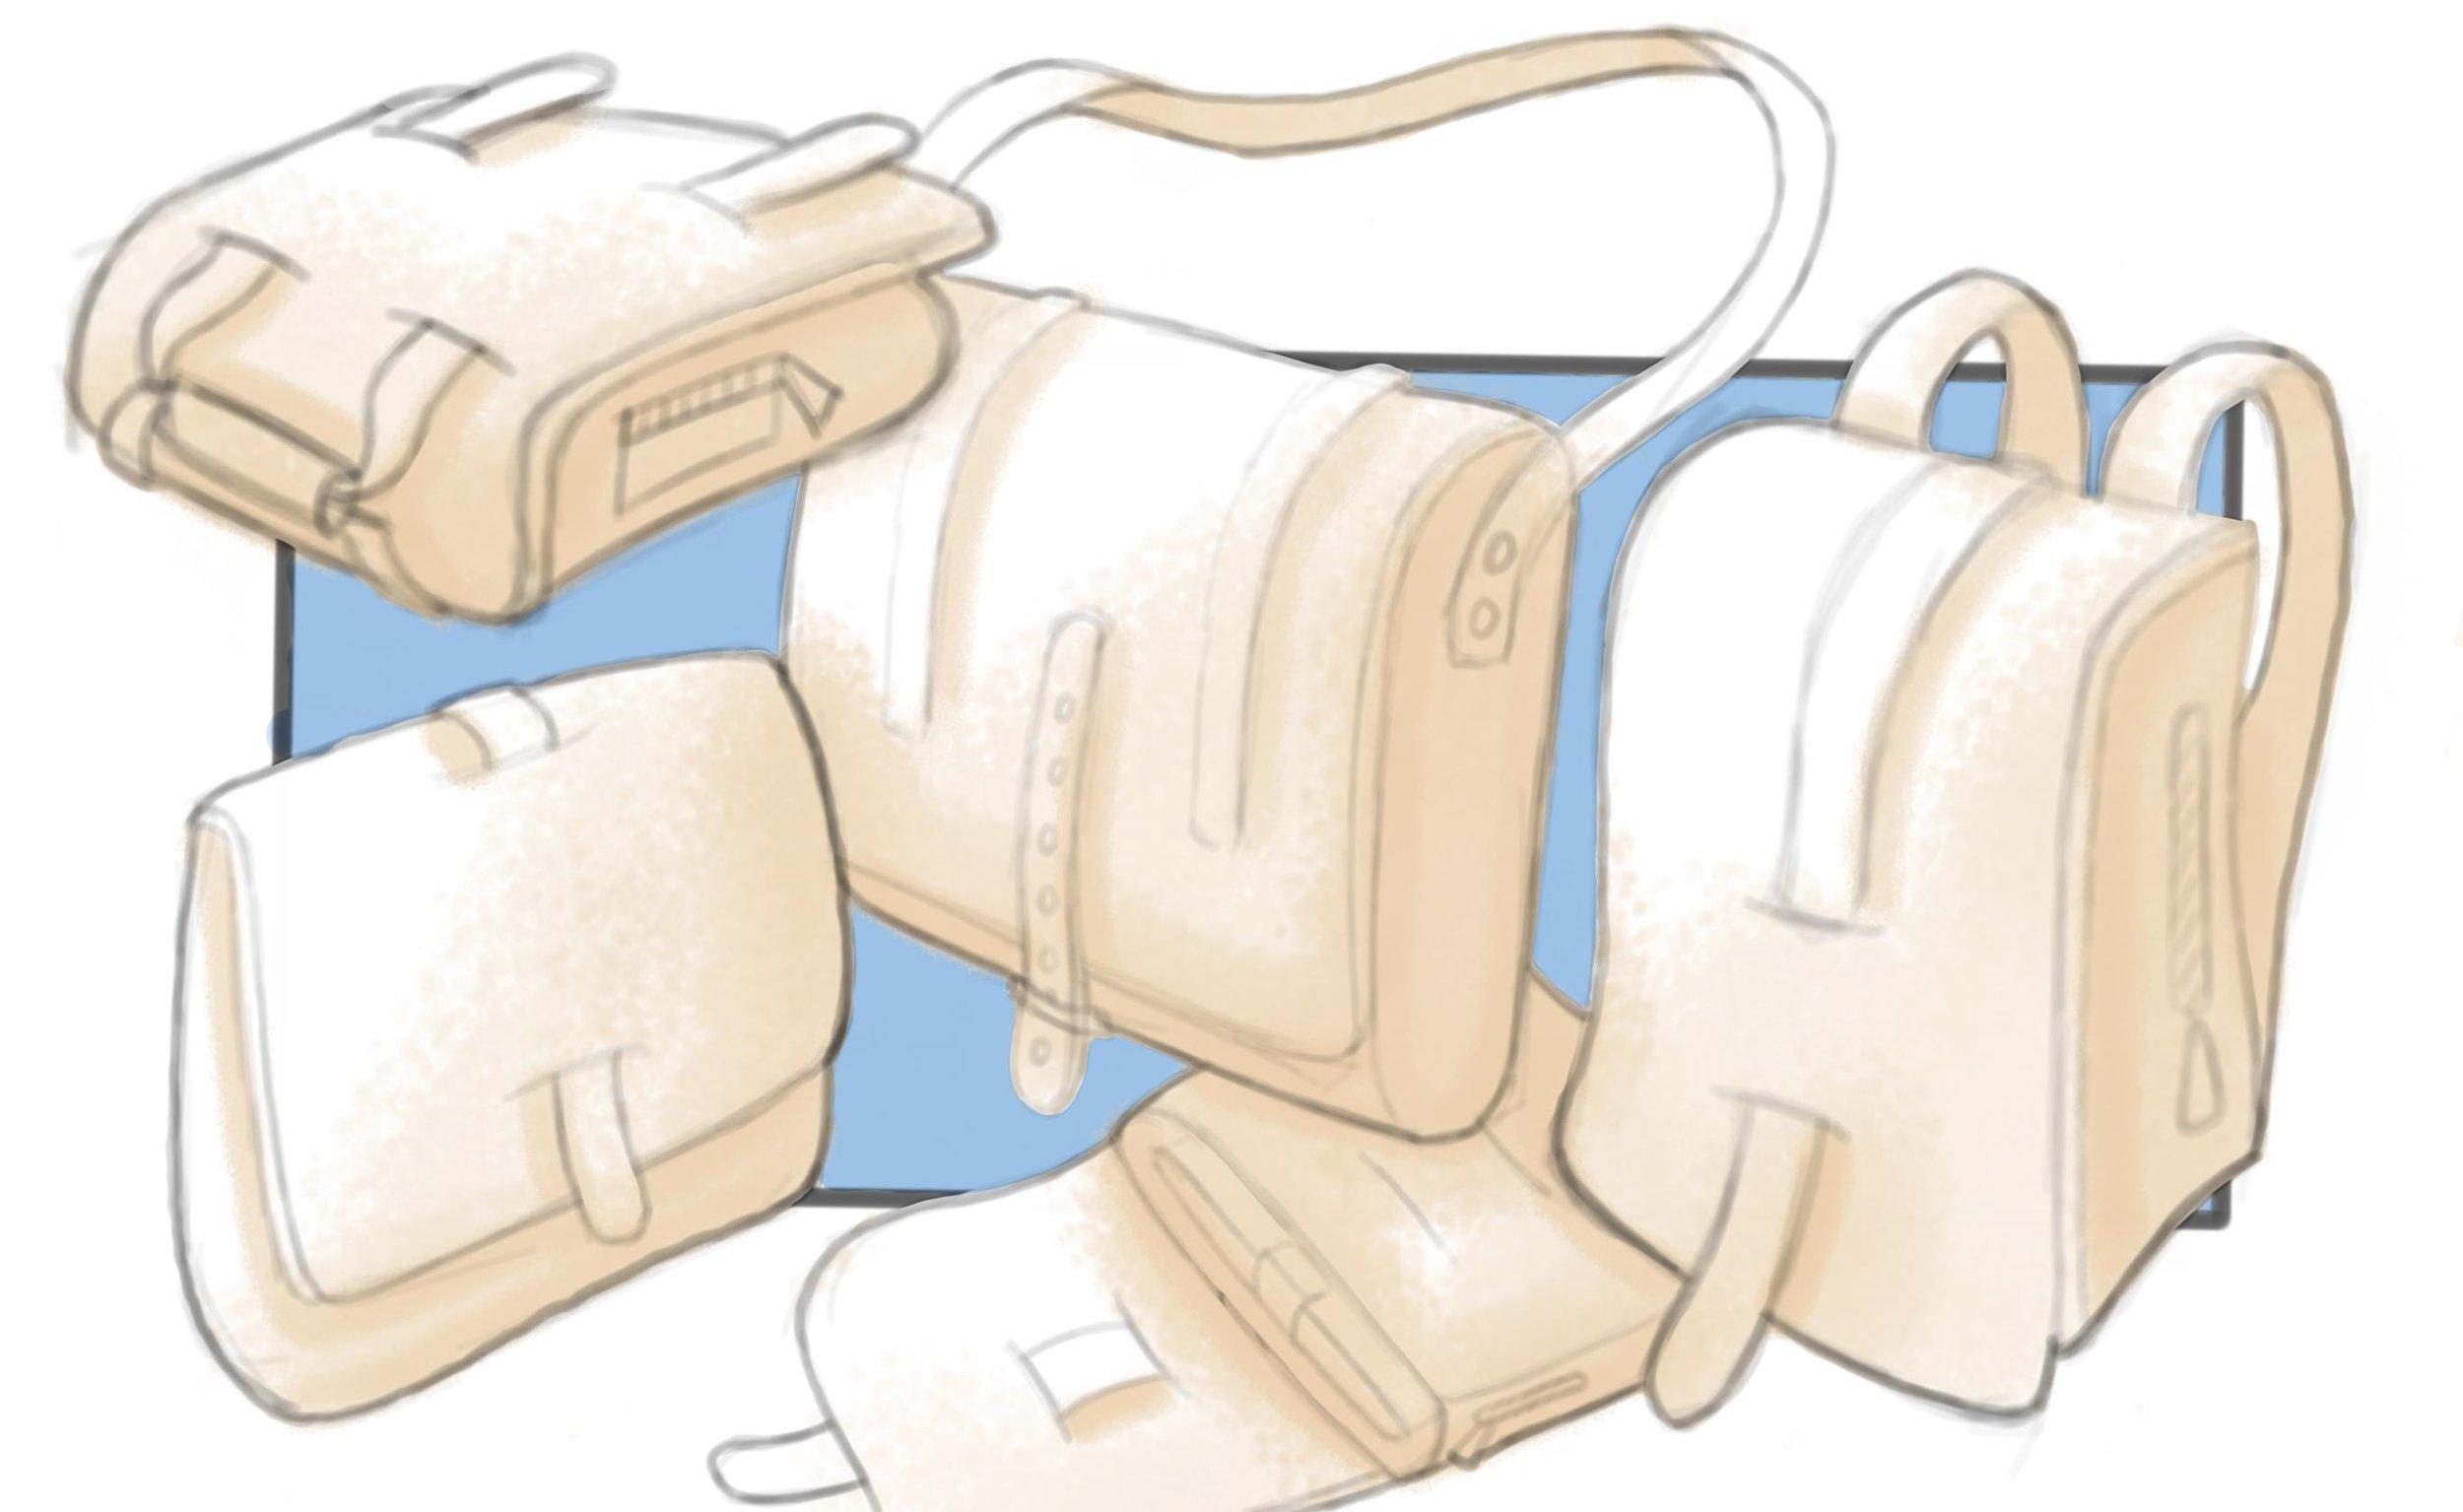 Rough Bag Ideation